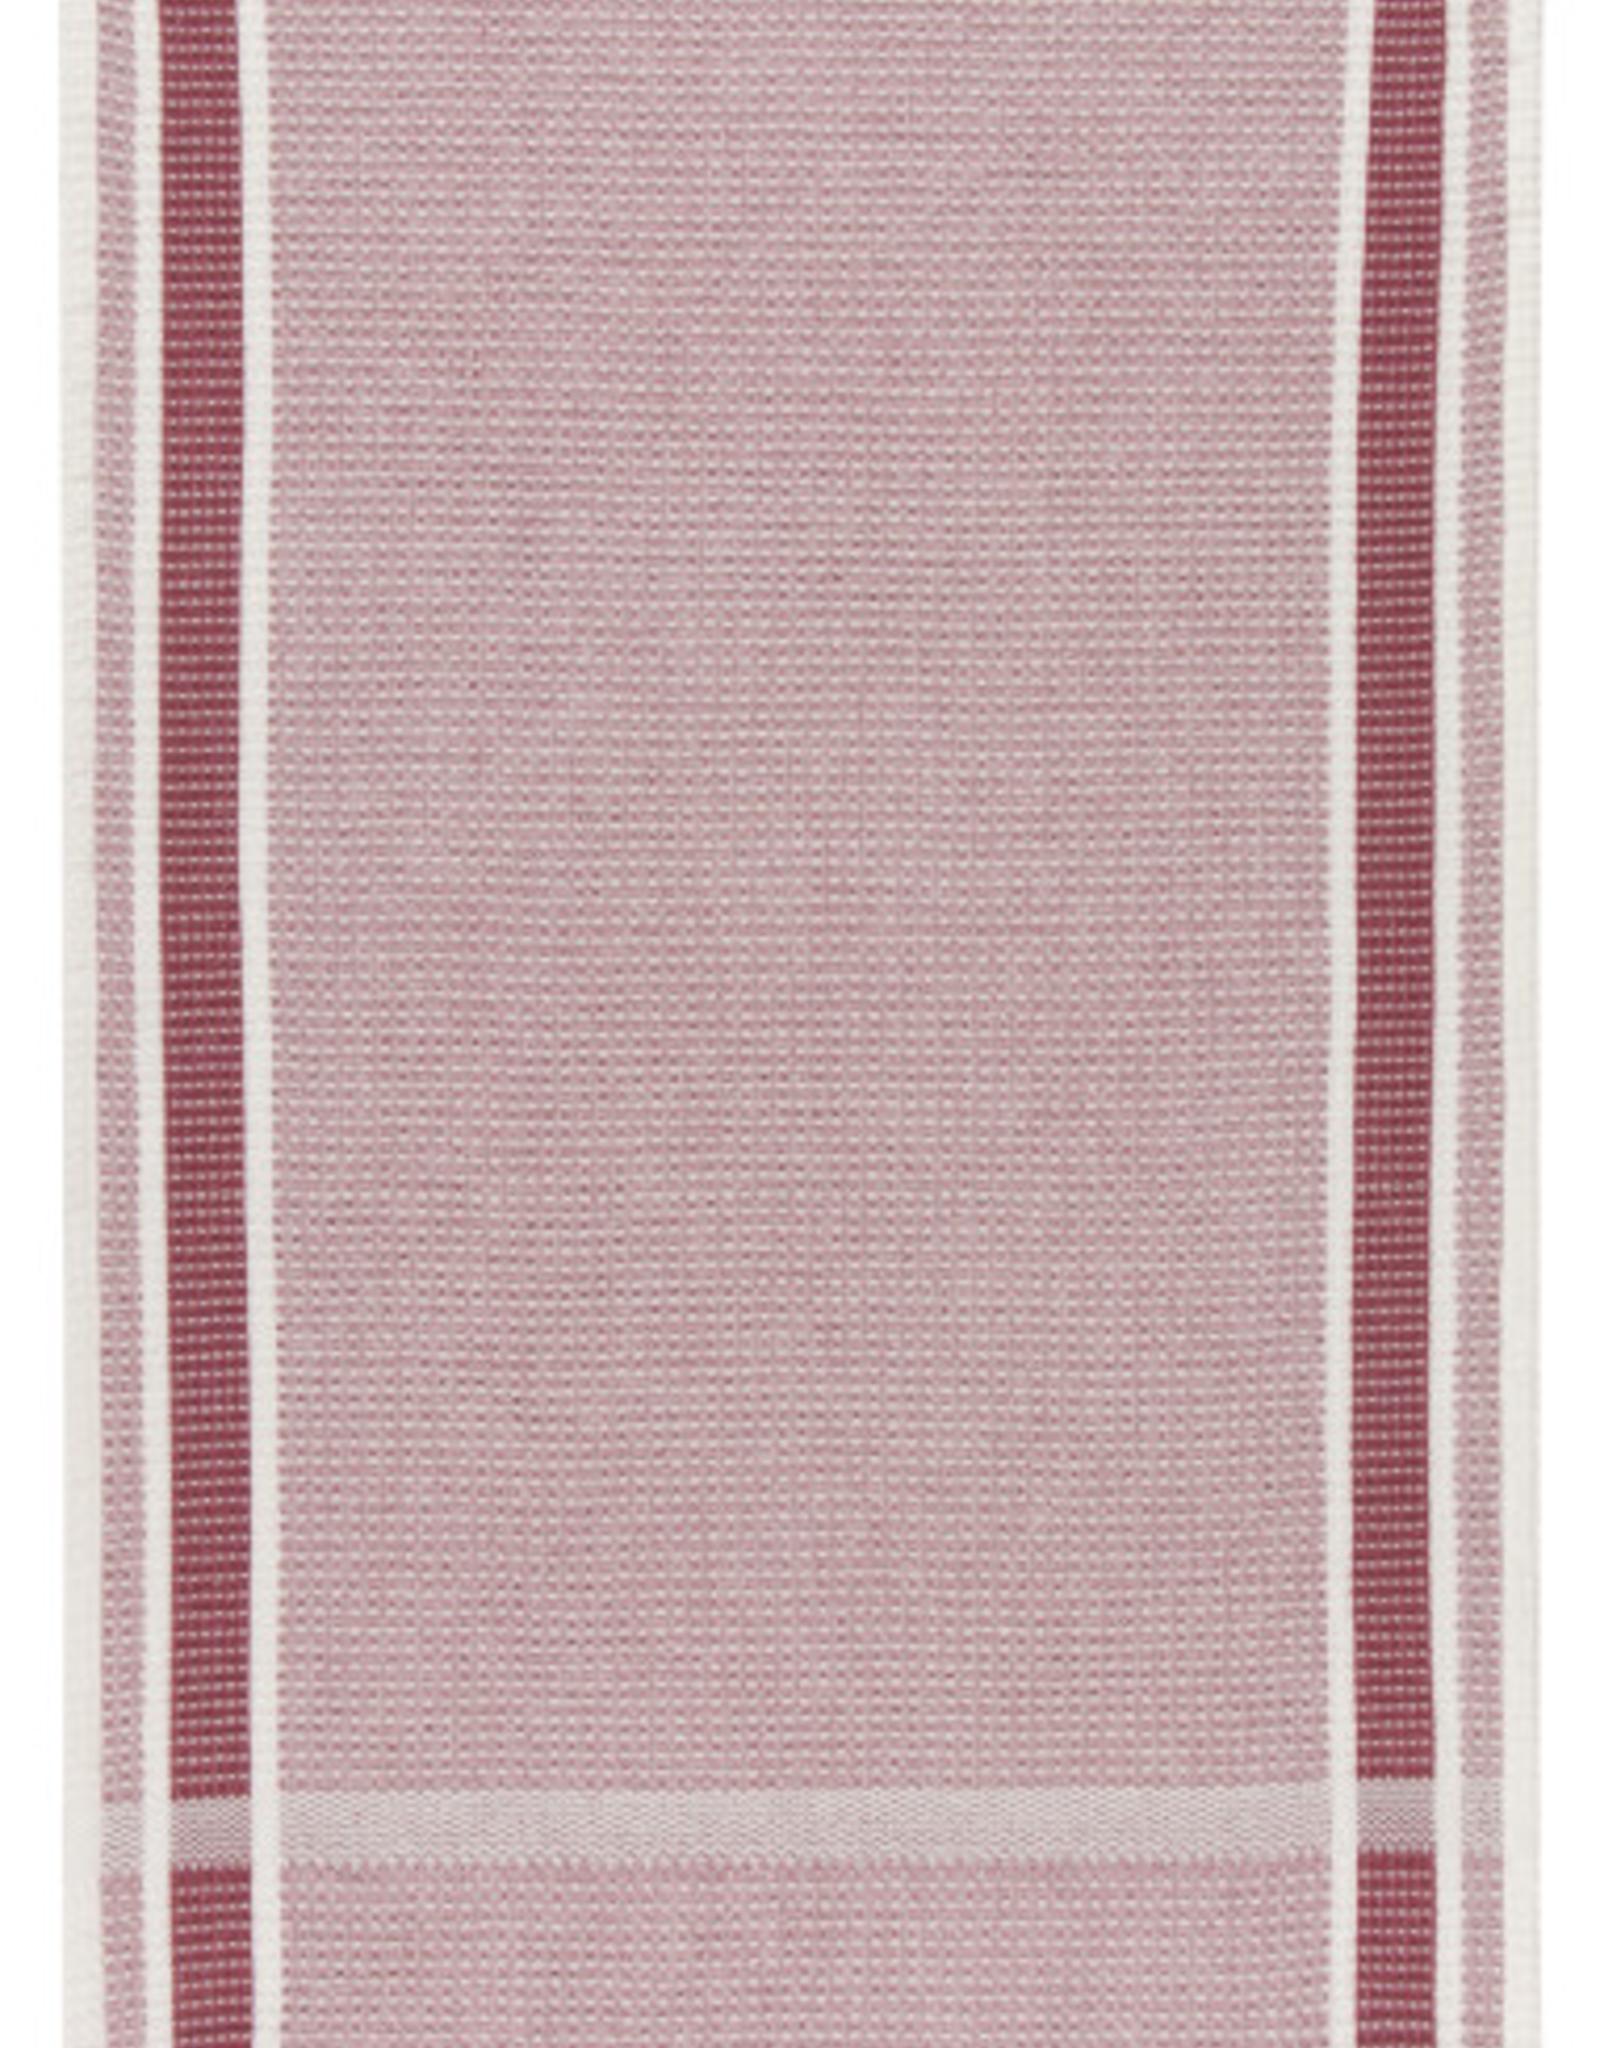 Danica Danica Waffle Tea Towel-Wine